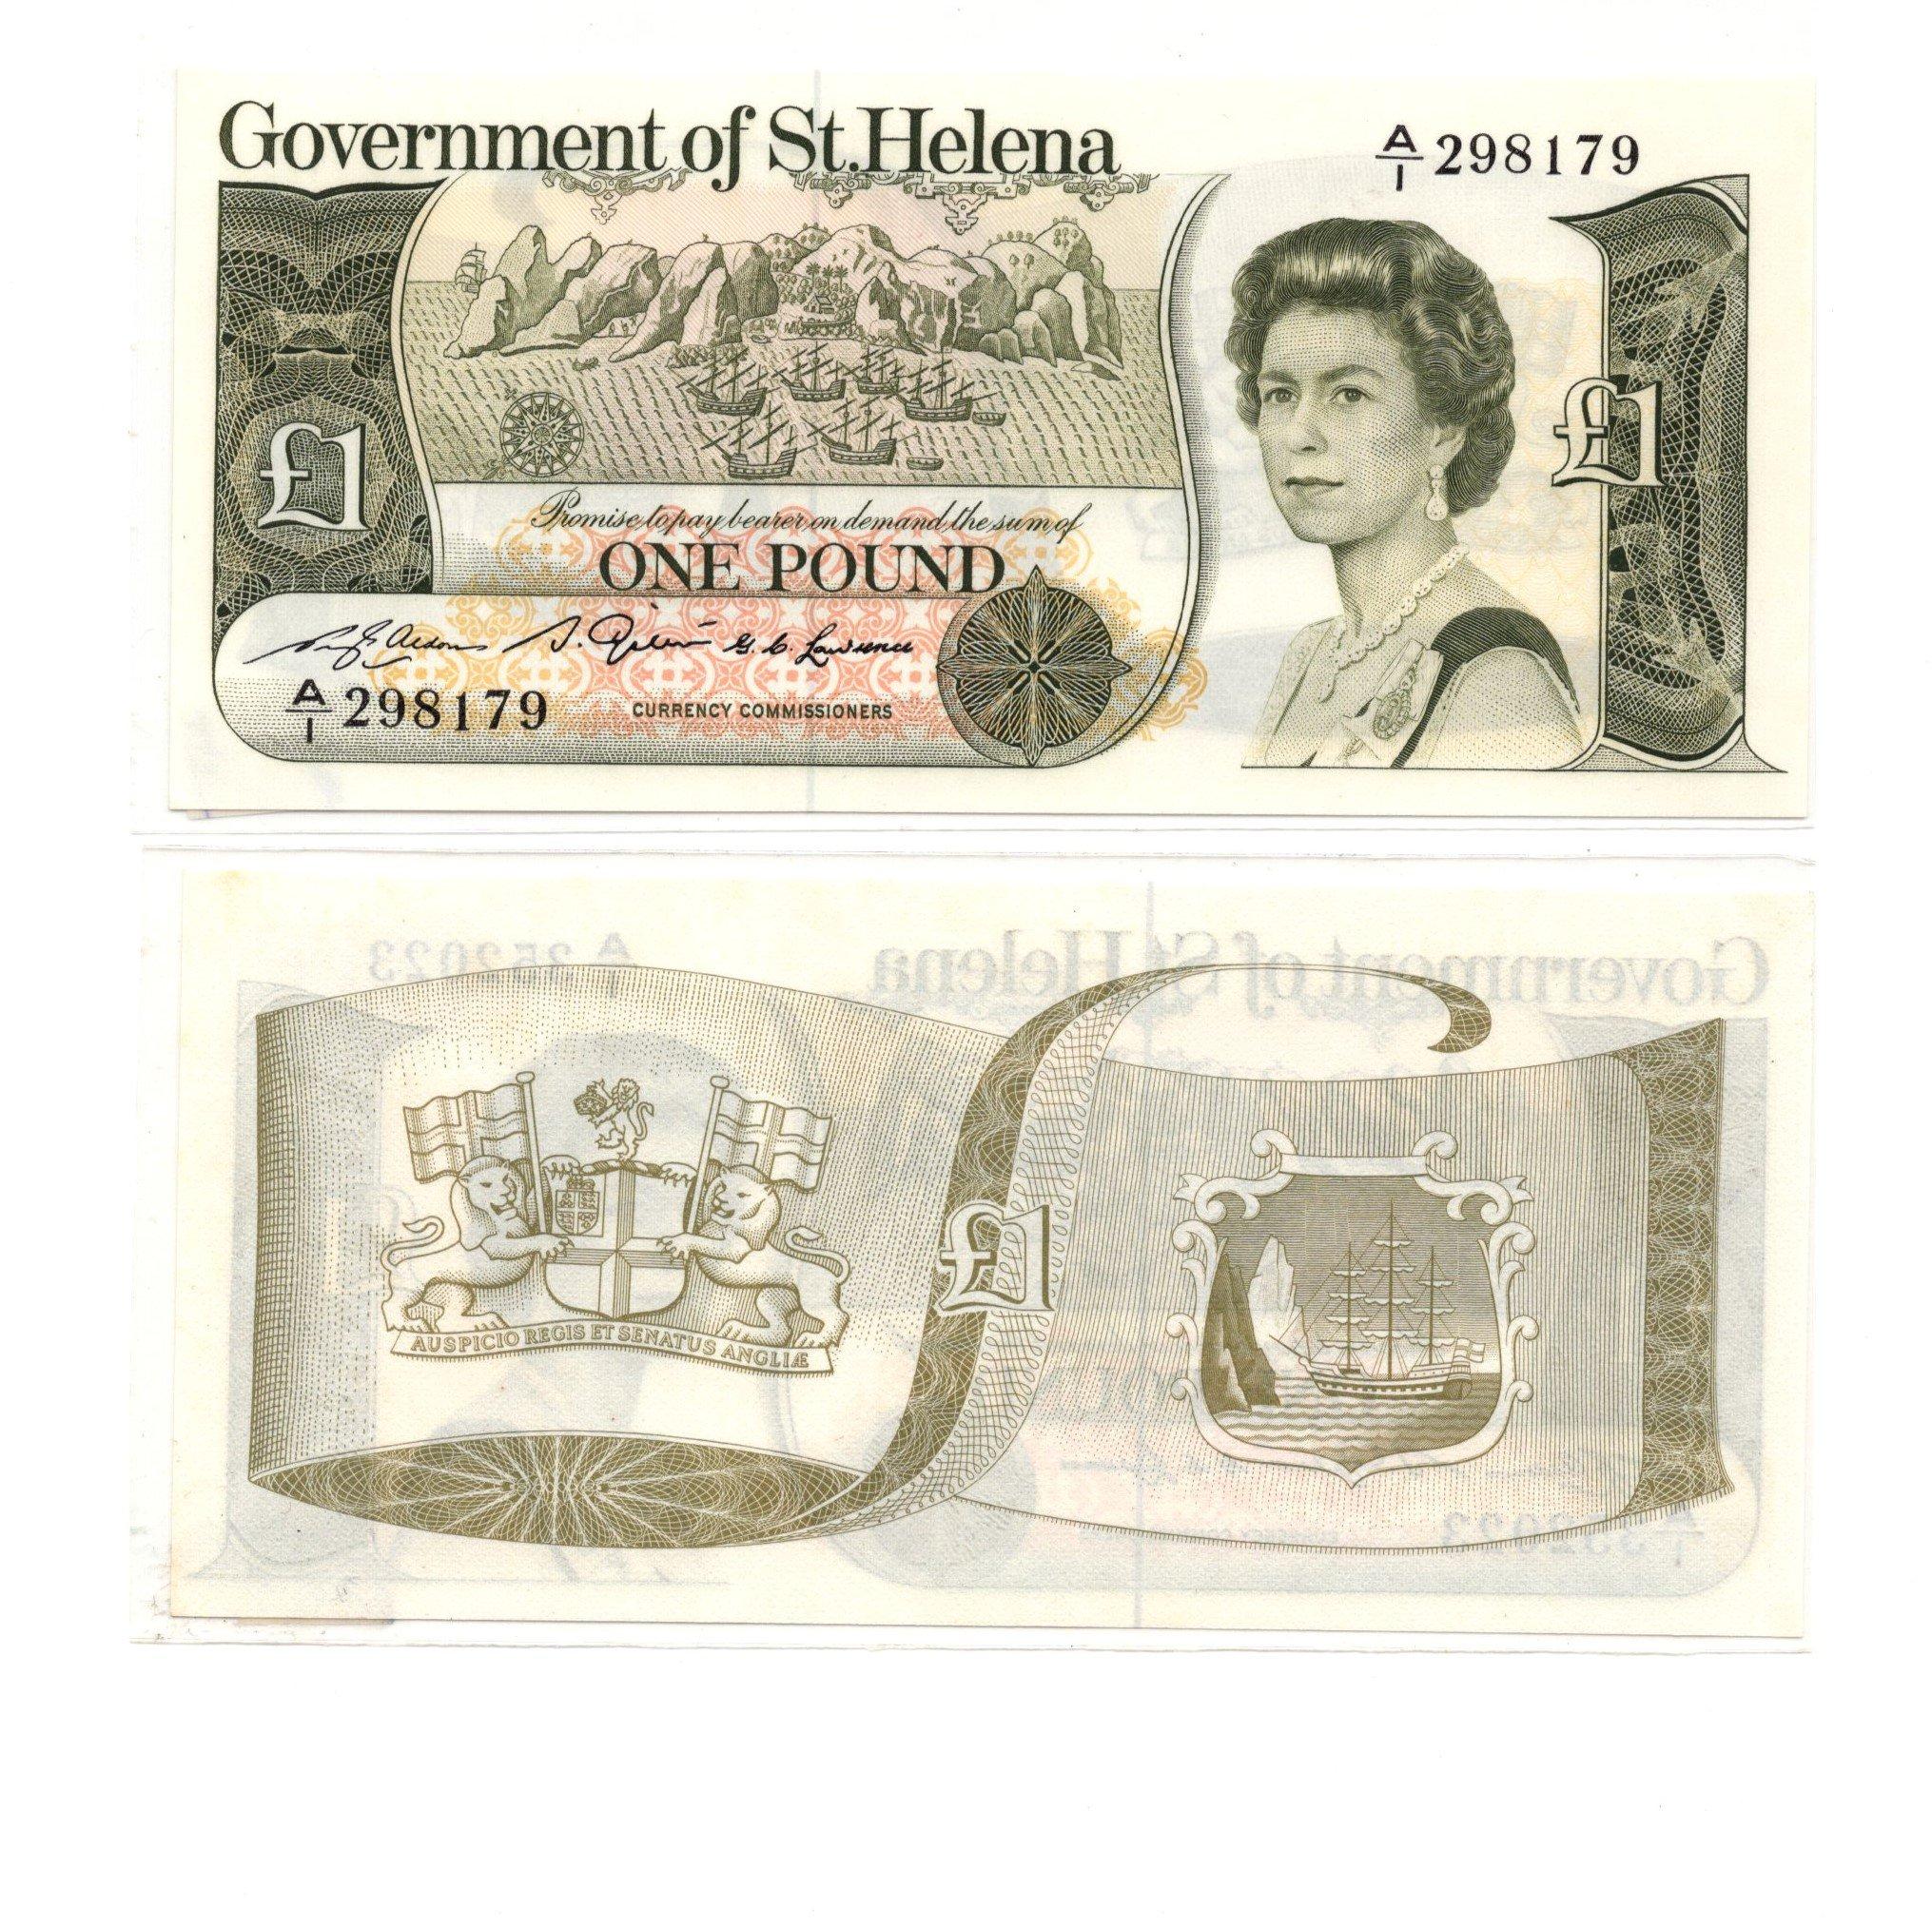 St. Helena 1 pound